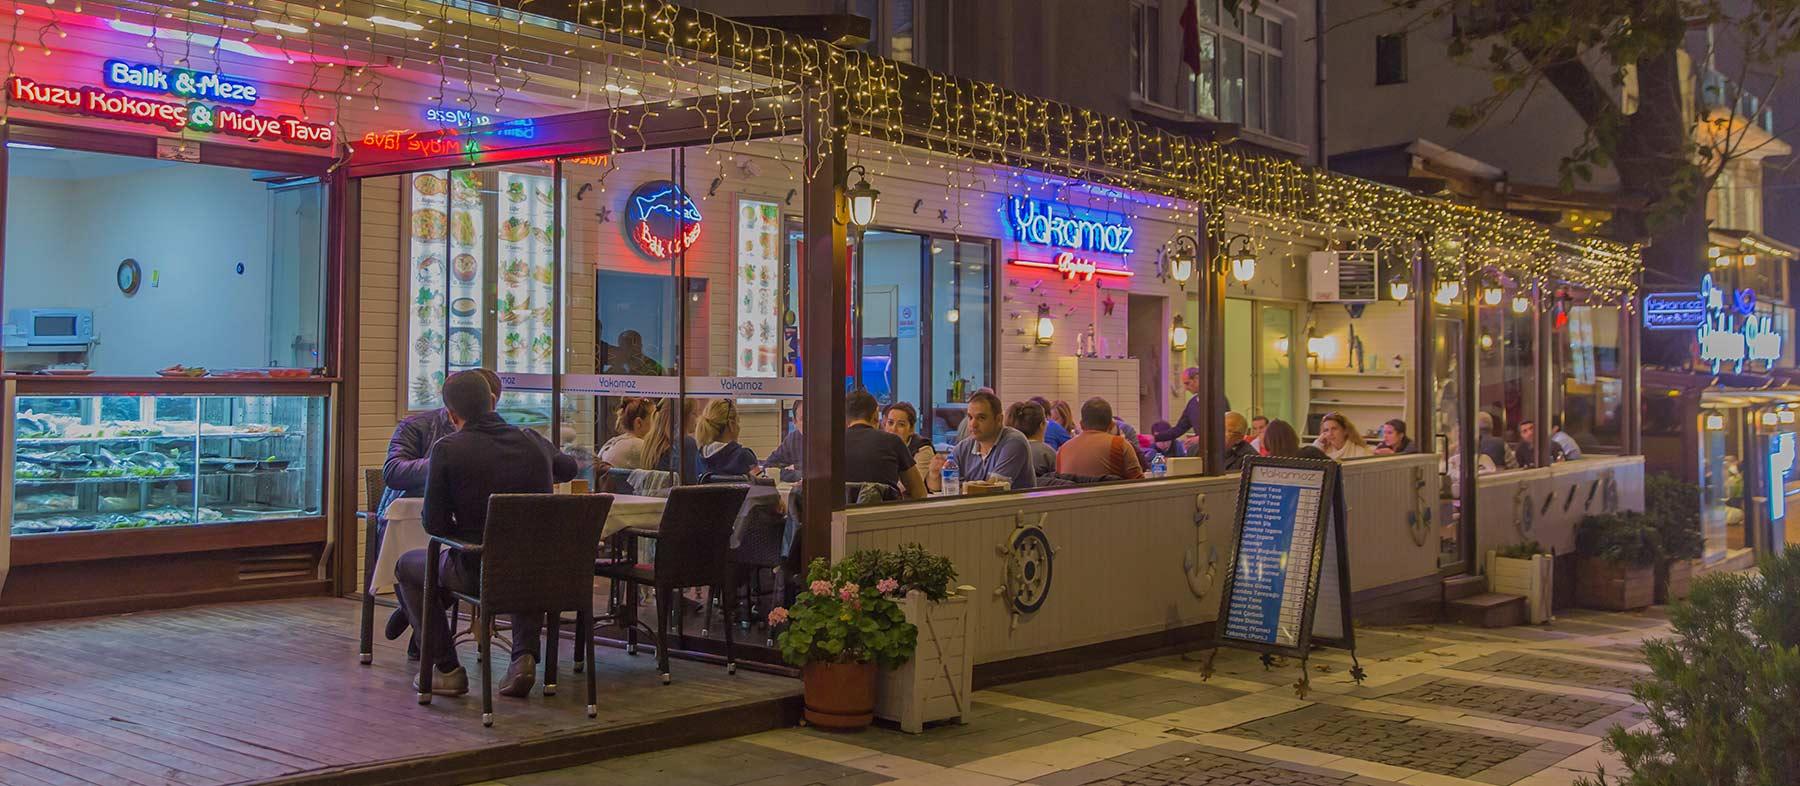 beylerbeyi_restaurant_slider